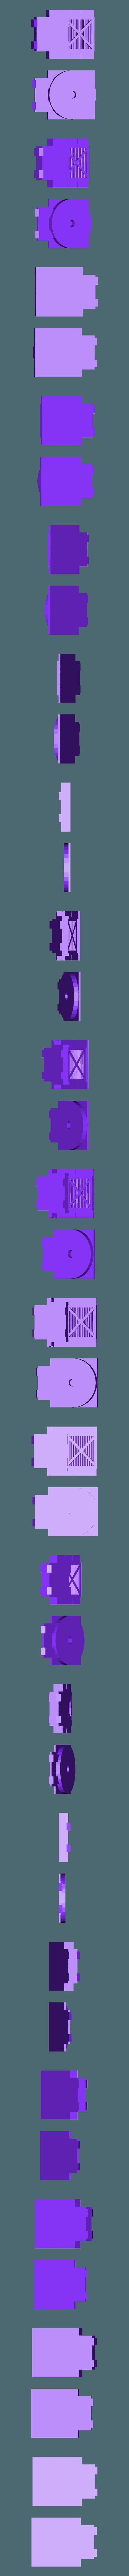 mk_d-4lt_pc_turret_base.stl Download free STL file Big Plasma Cannon Turret • 3D printing design, JtStrait72